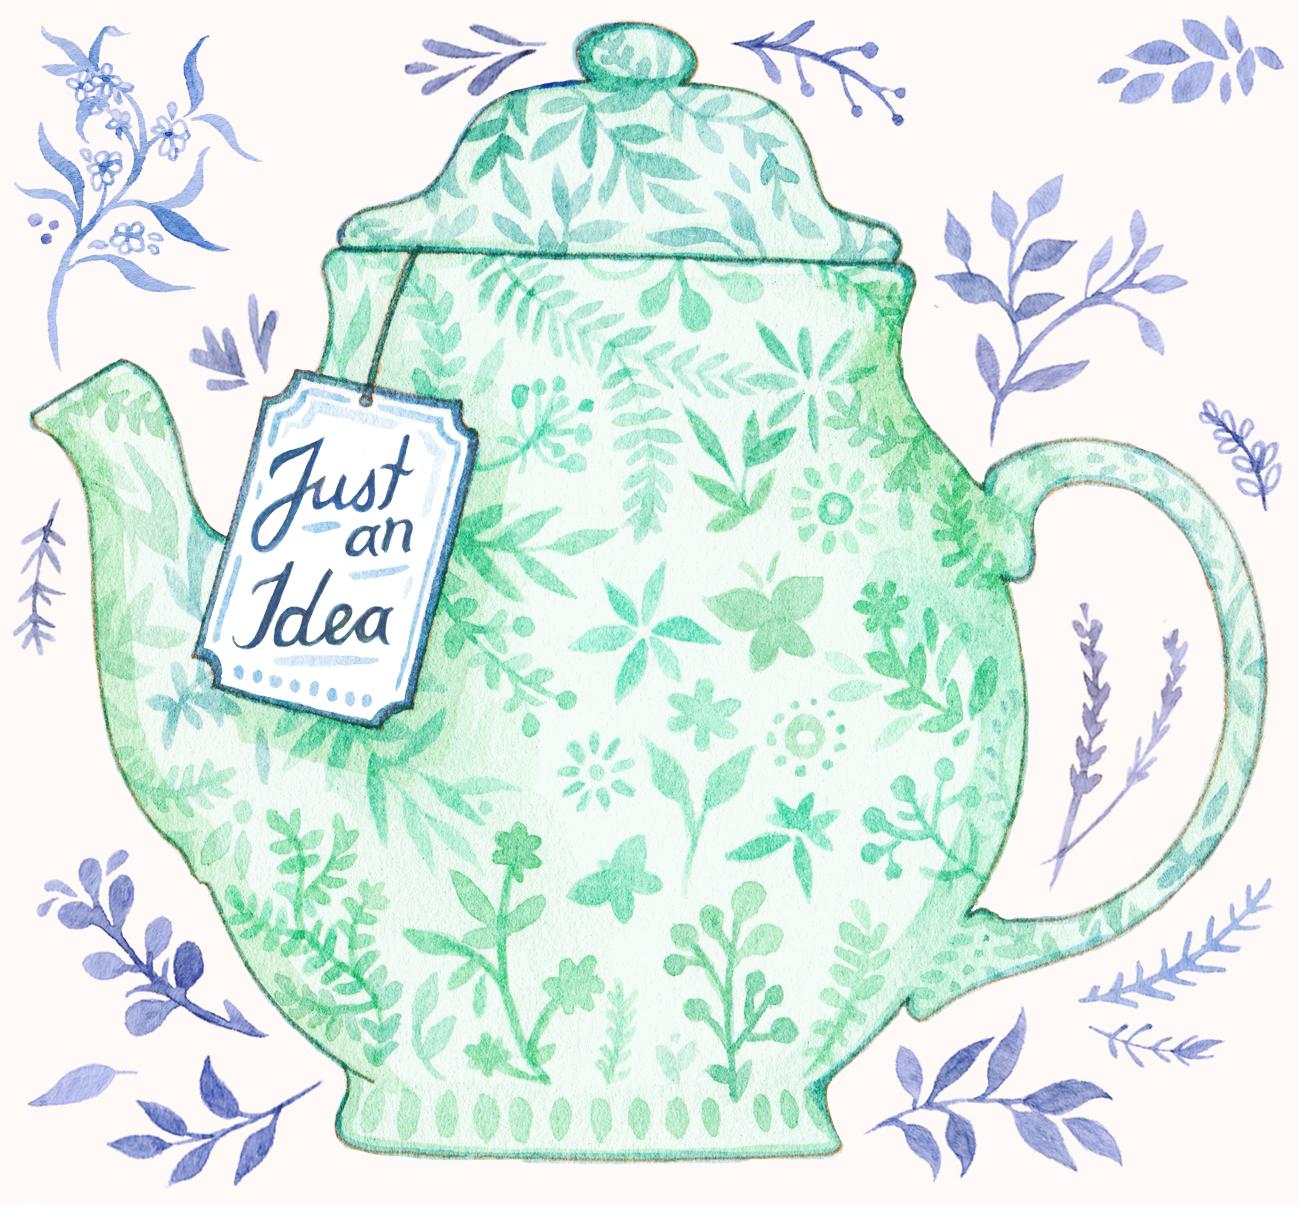 justanidea-tea-illustration.PNG